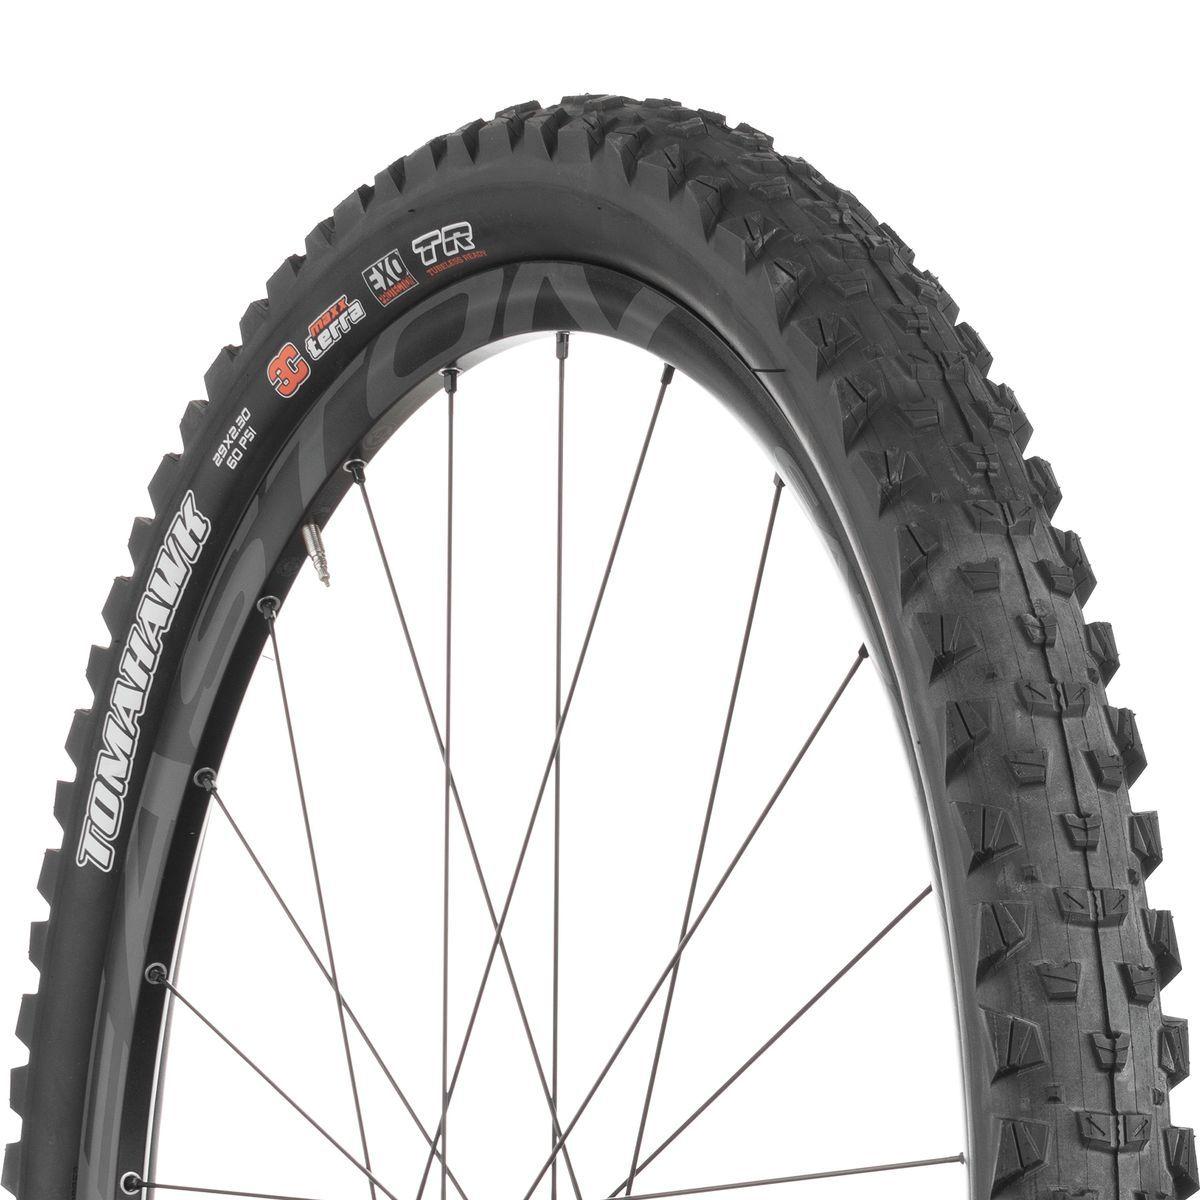 Maxxis Tomahawk 3c Exo Tr Tire 29in Mountain Bike Tires